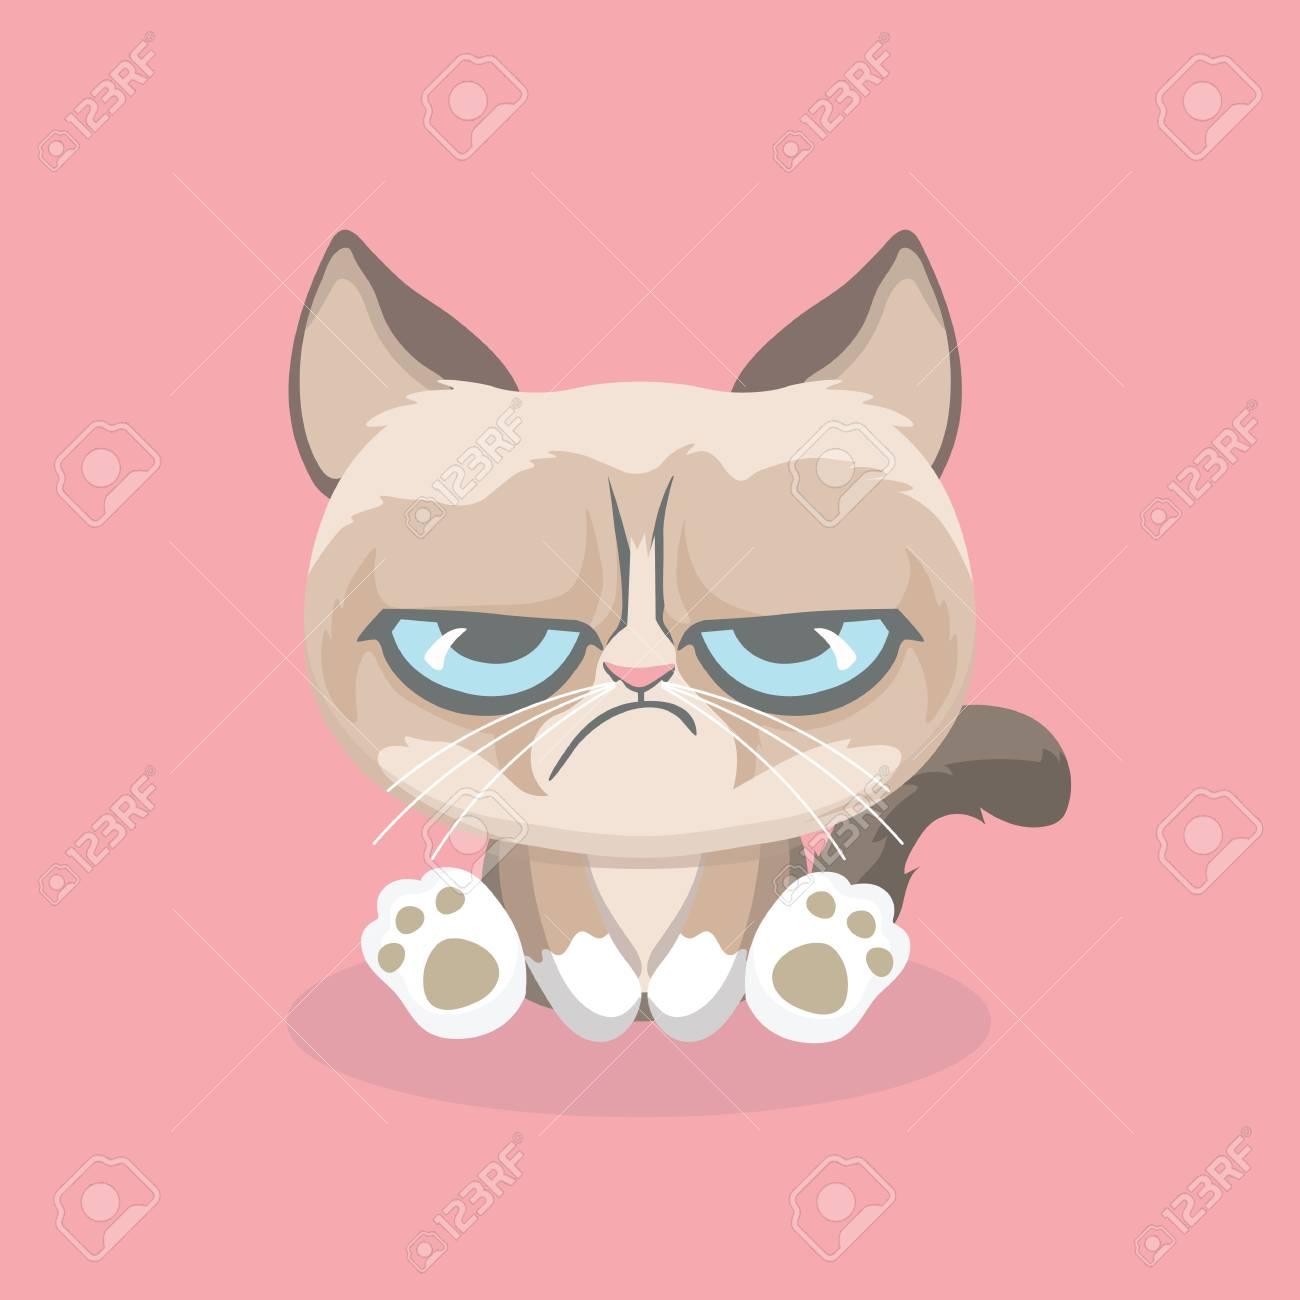 Cute grumpy cat. Vector Illustration. - 102215711